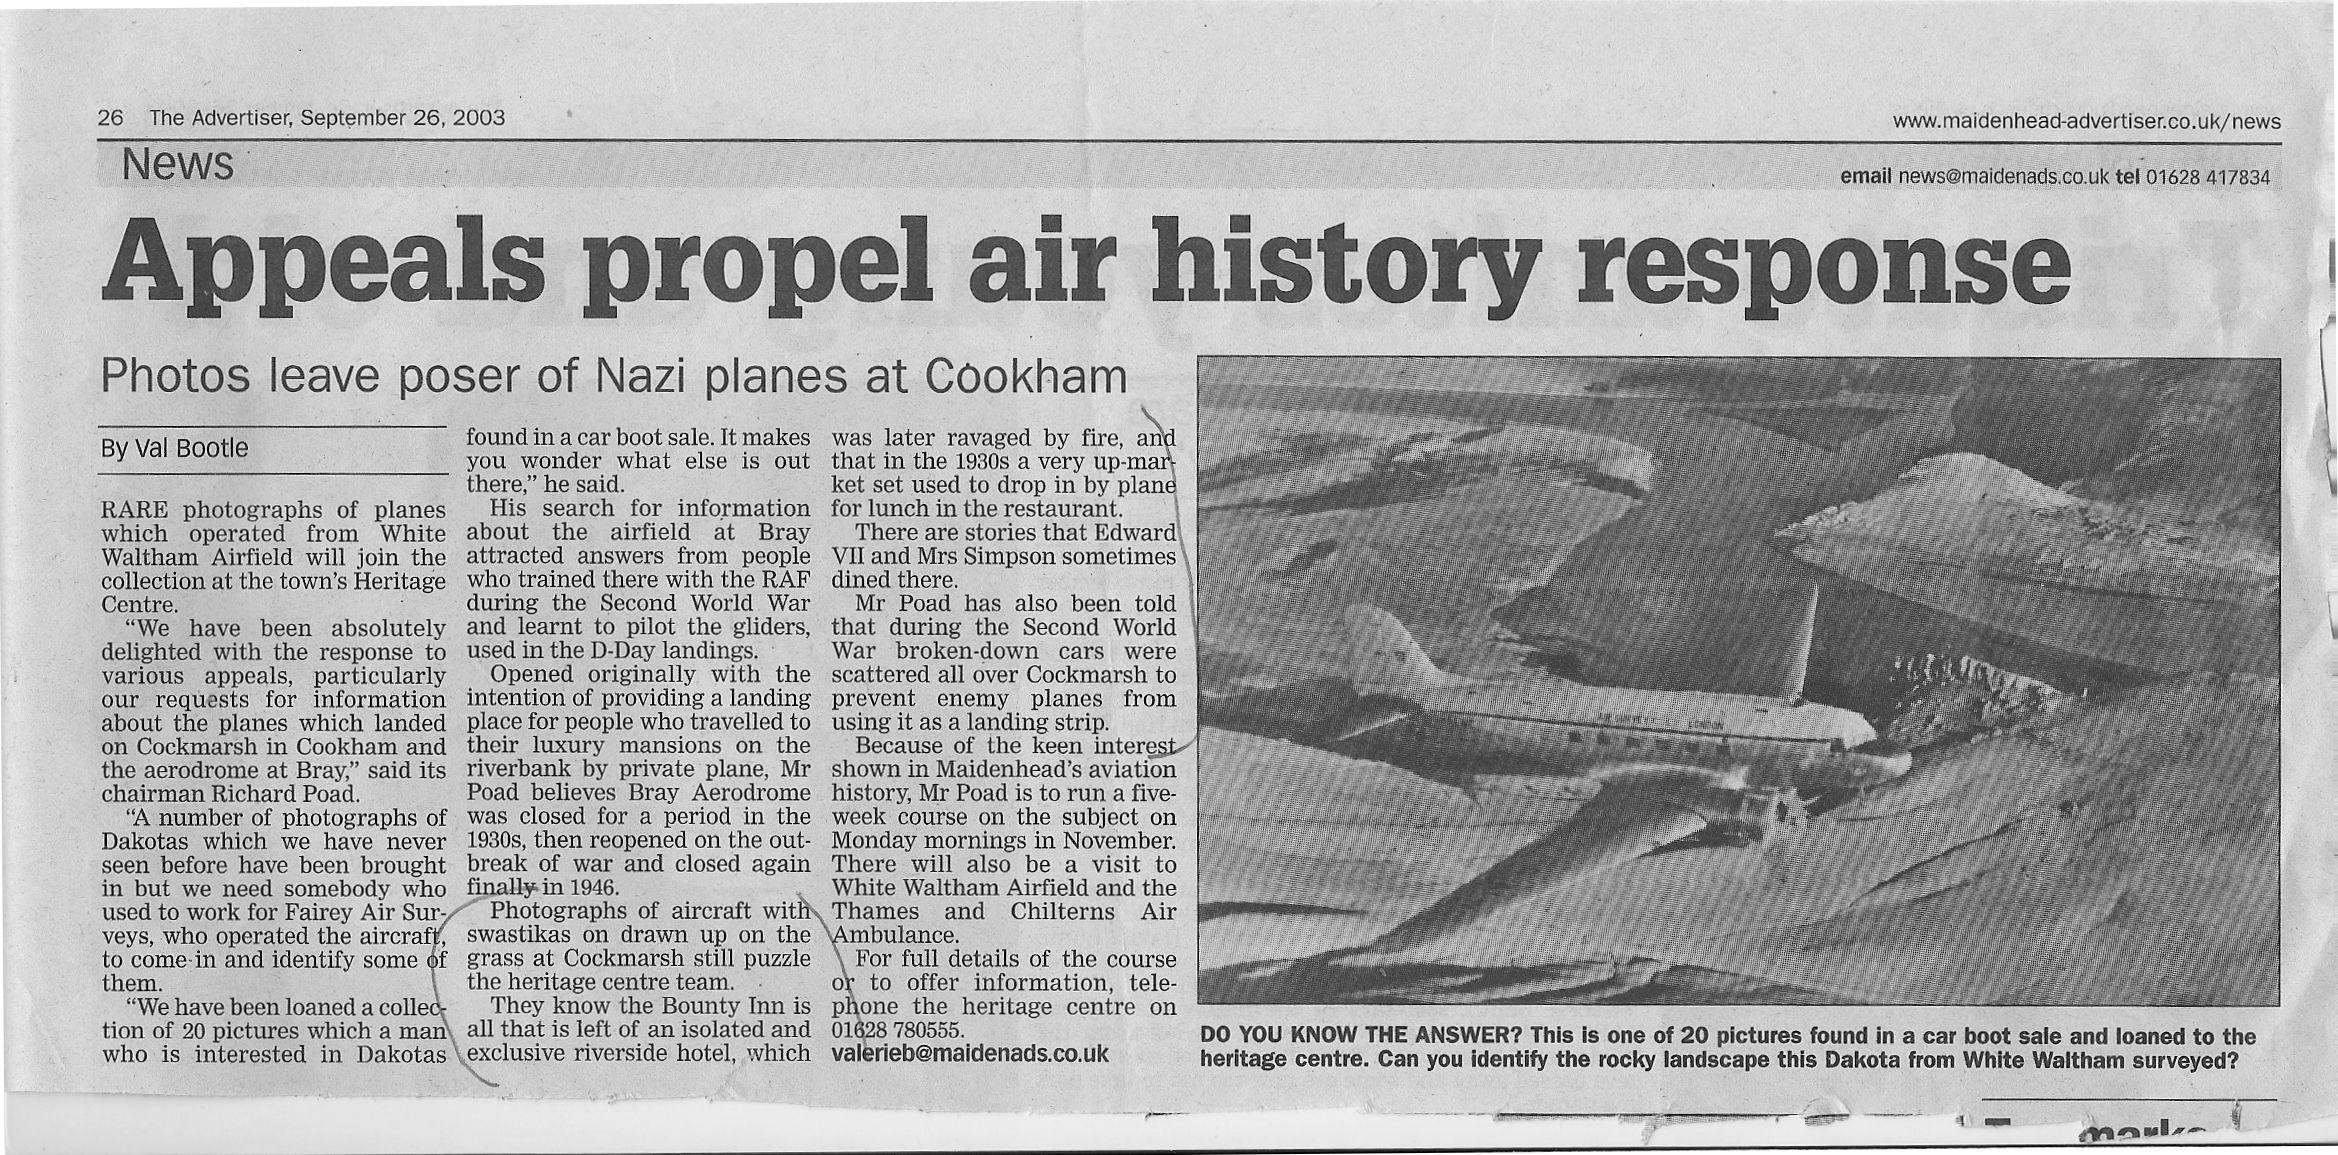 Maidenhead Advertiser cutting - September 2003